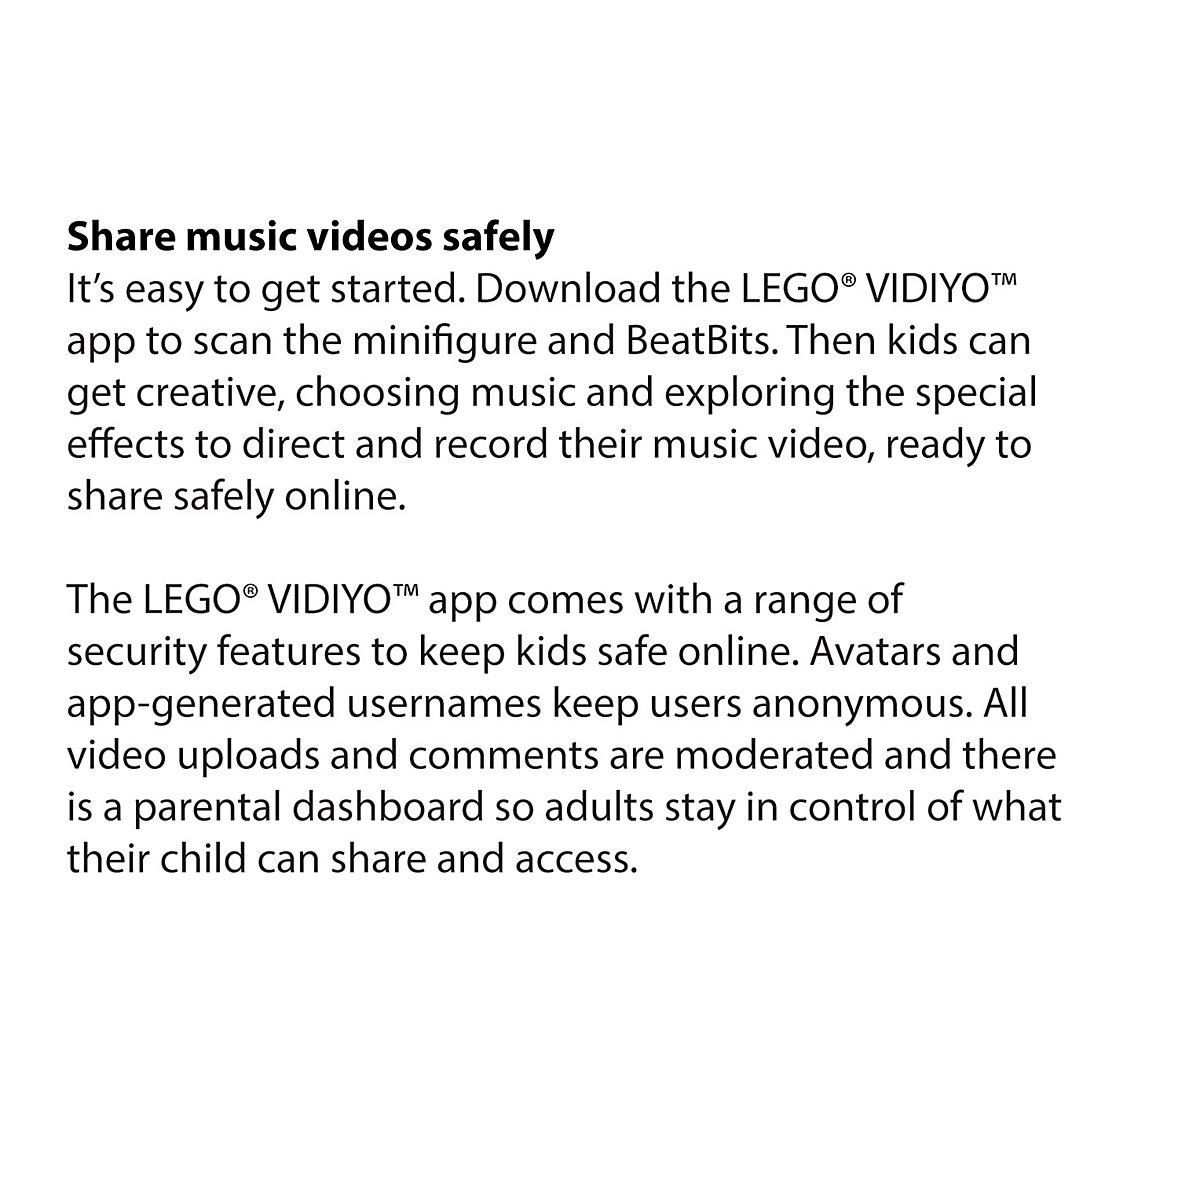 Lego Vidiyo Information